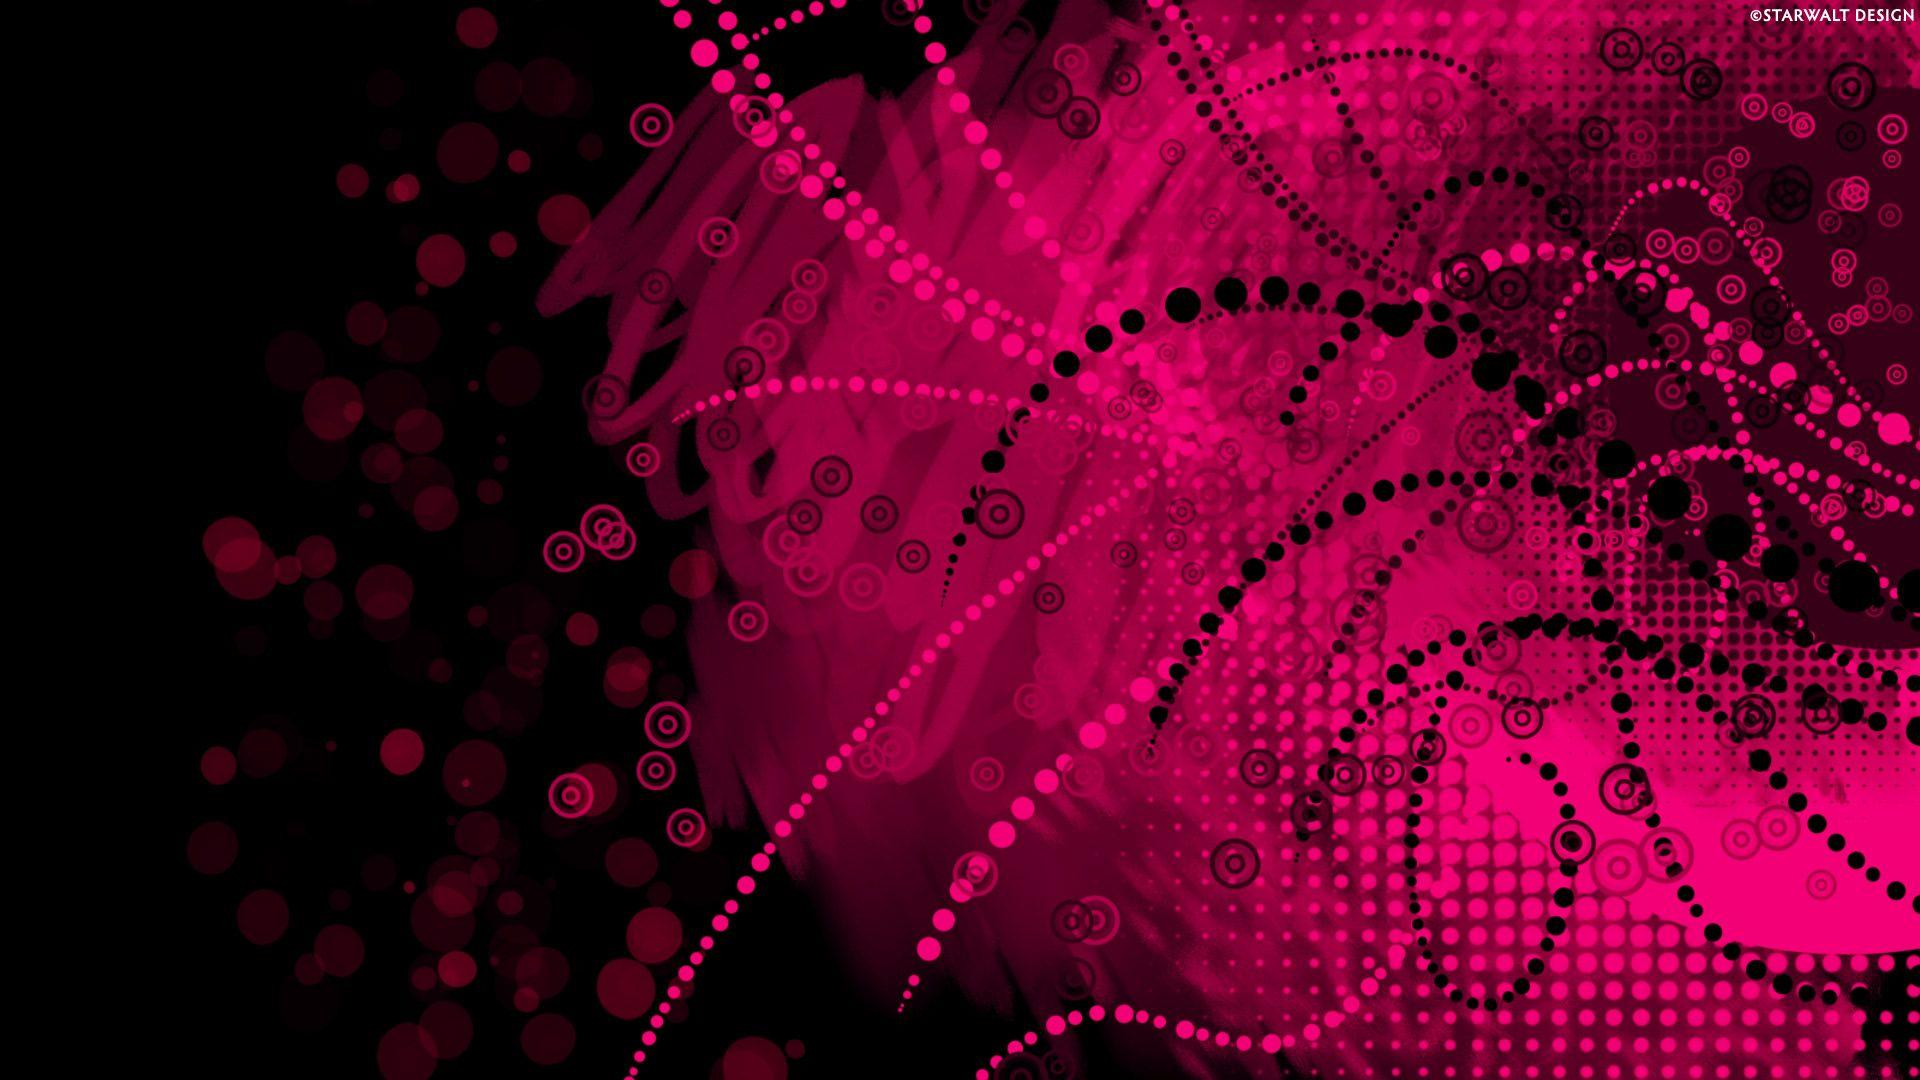 Pink Wallpaper Hd Wallpaper Pink And Black Wallpaper Pink Camo Wallpaper Black Background Wallpaper